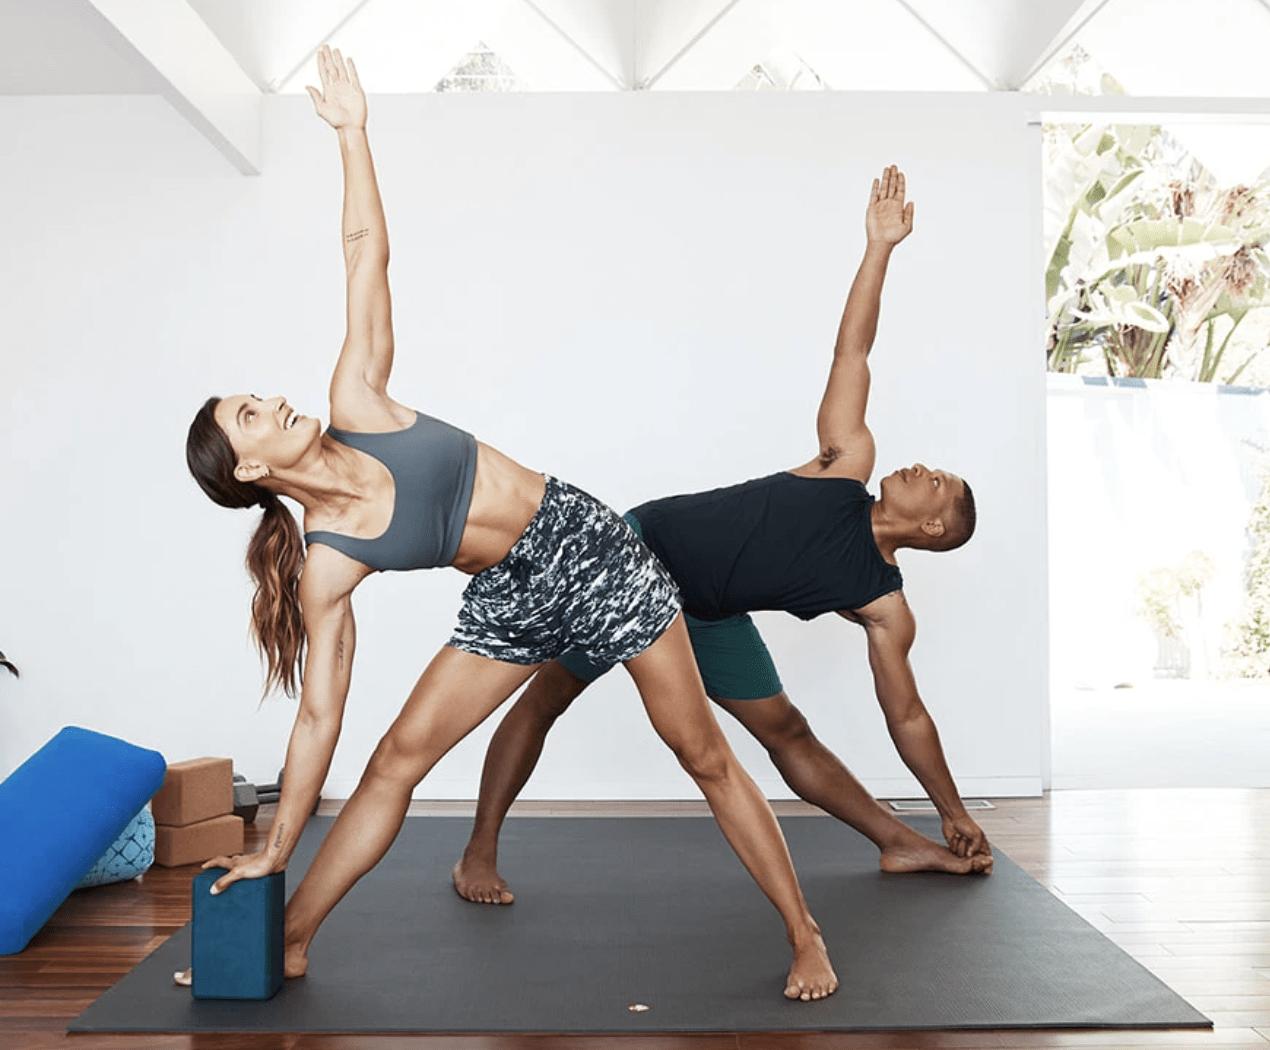 Manduka yoga mat self-care gift ideas